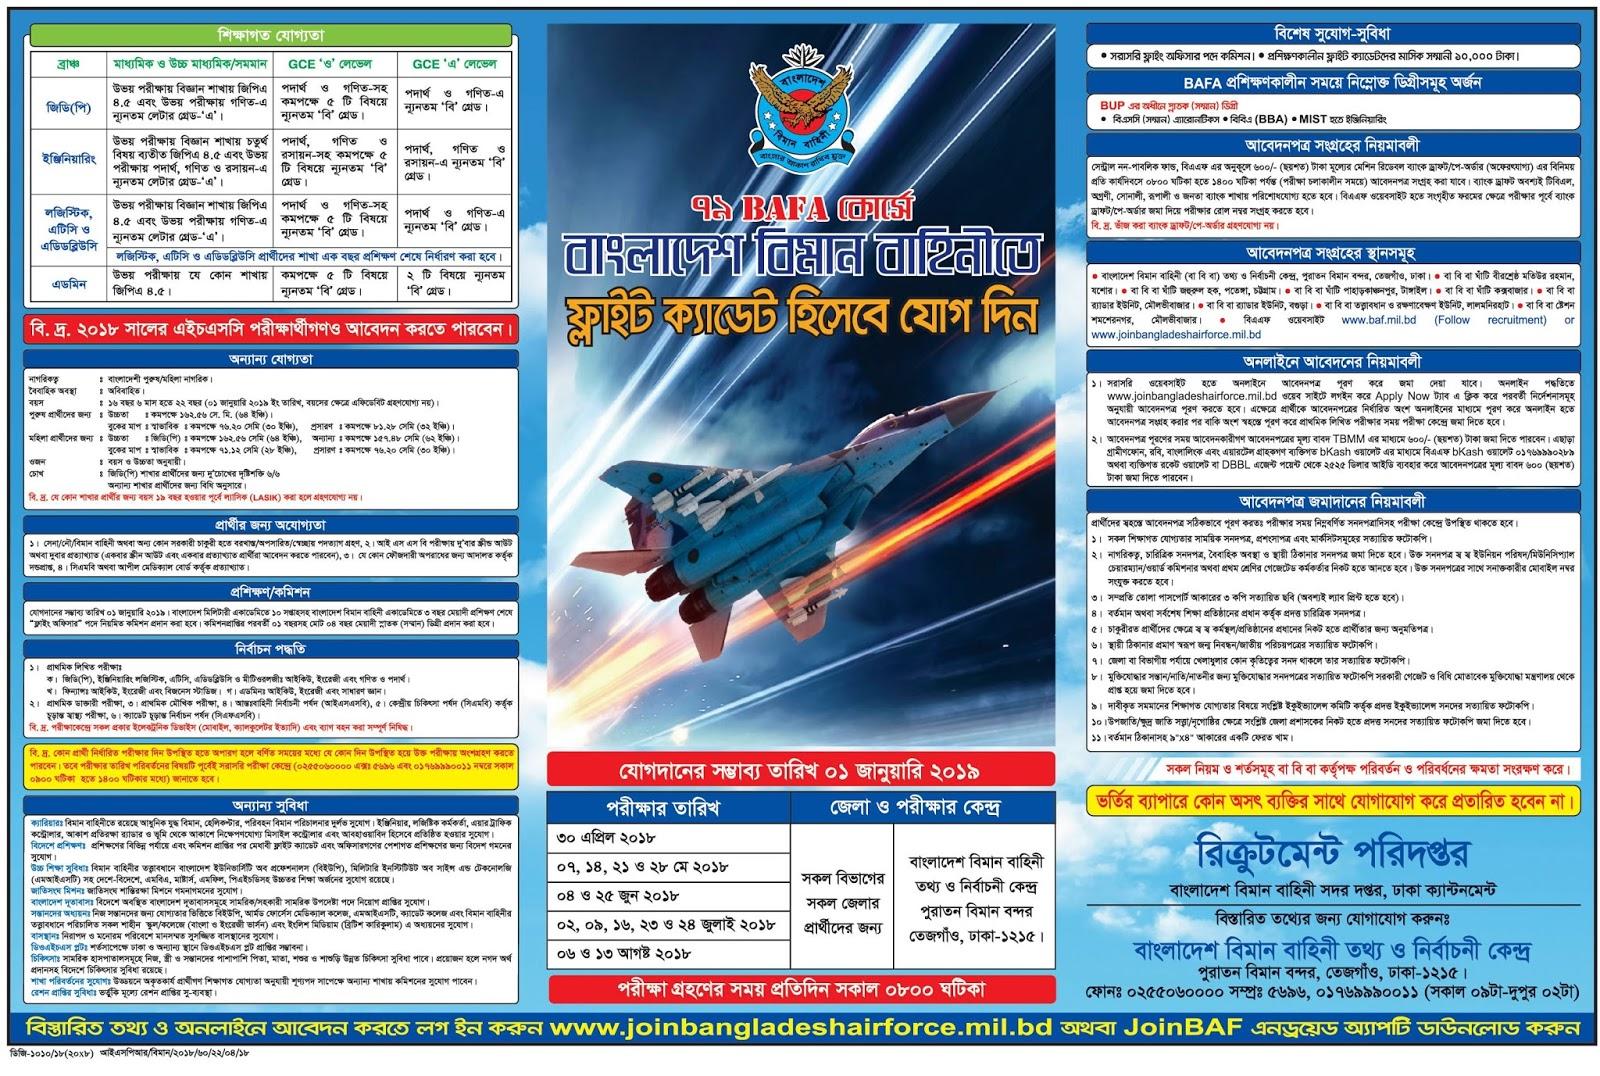 Bangladesh Air Force BAFA-79 Course Cadet Recruitment Circular 2018